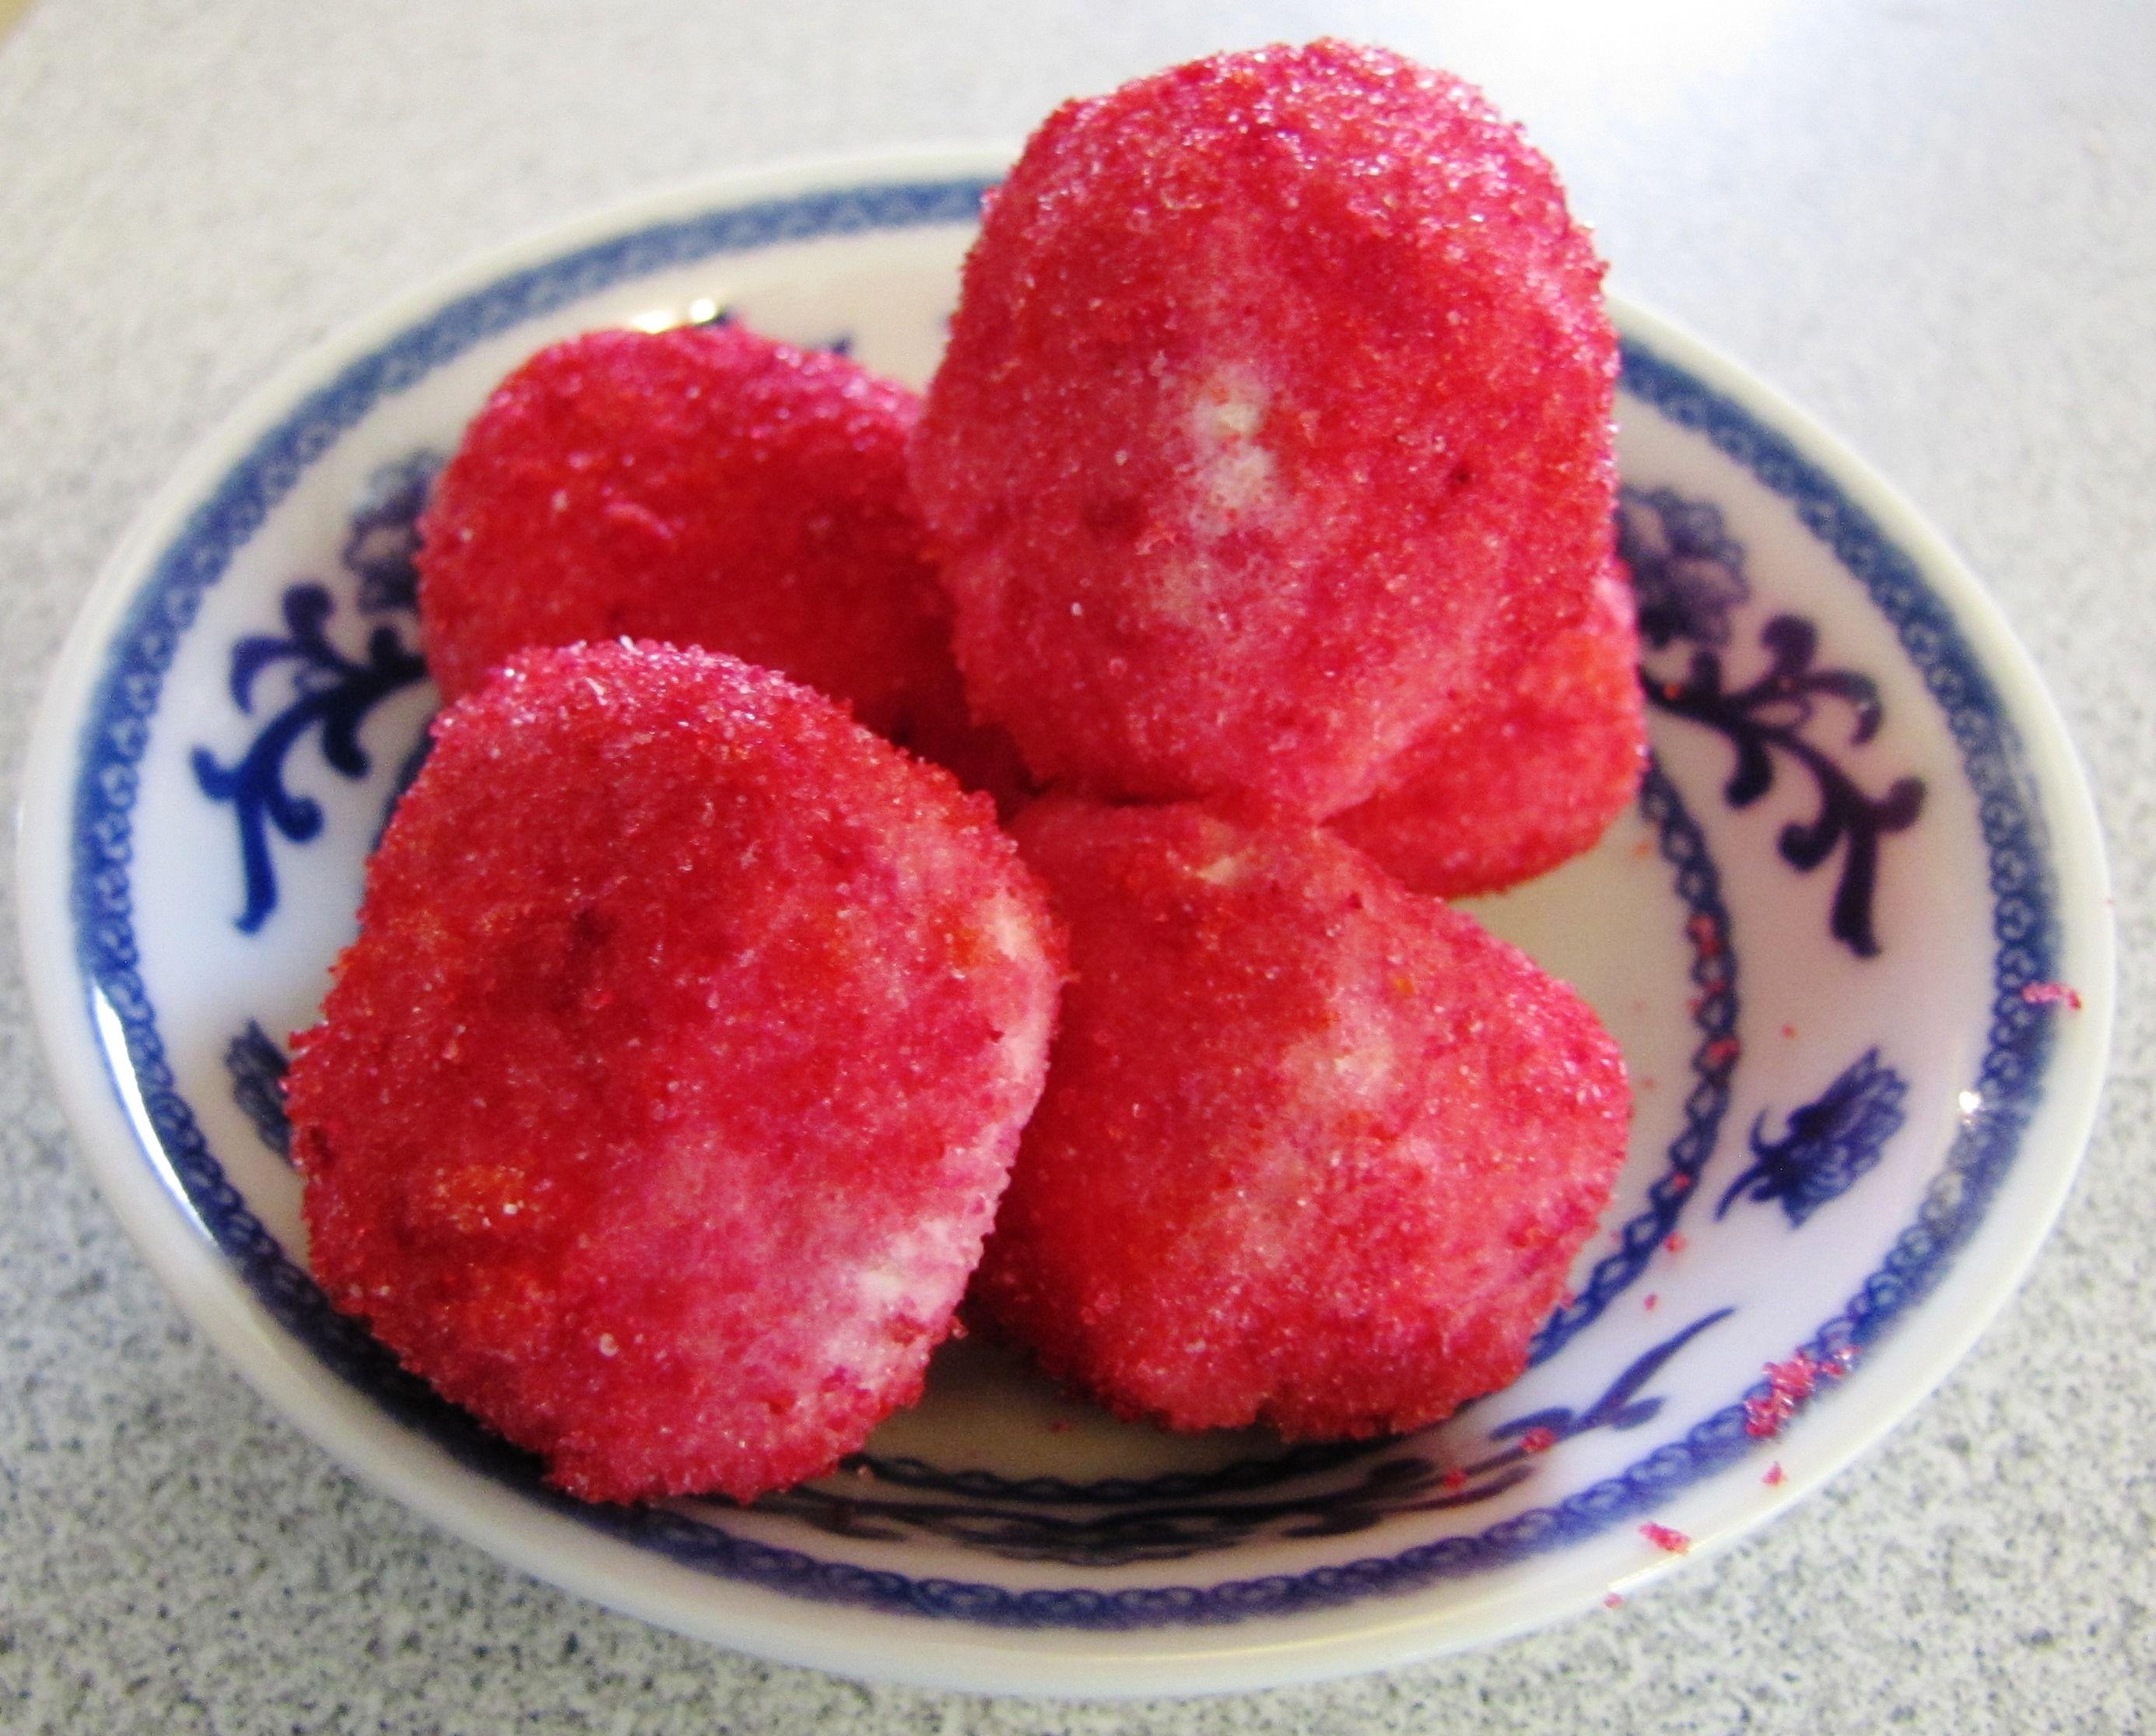 jell-o recipes | Ketogenic Snack Recipe: Jello Cream Cheese Balls Ketogenic Woman | Jell-o ...